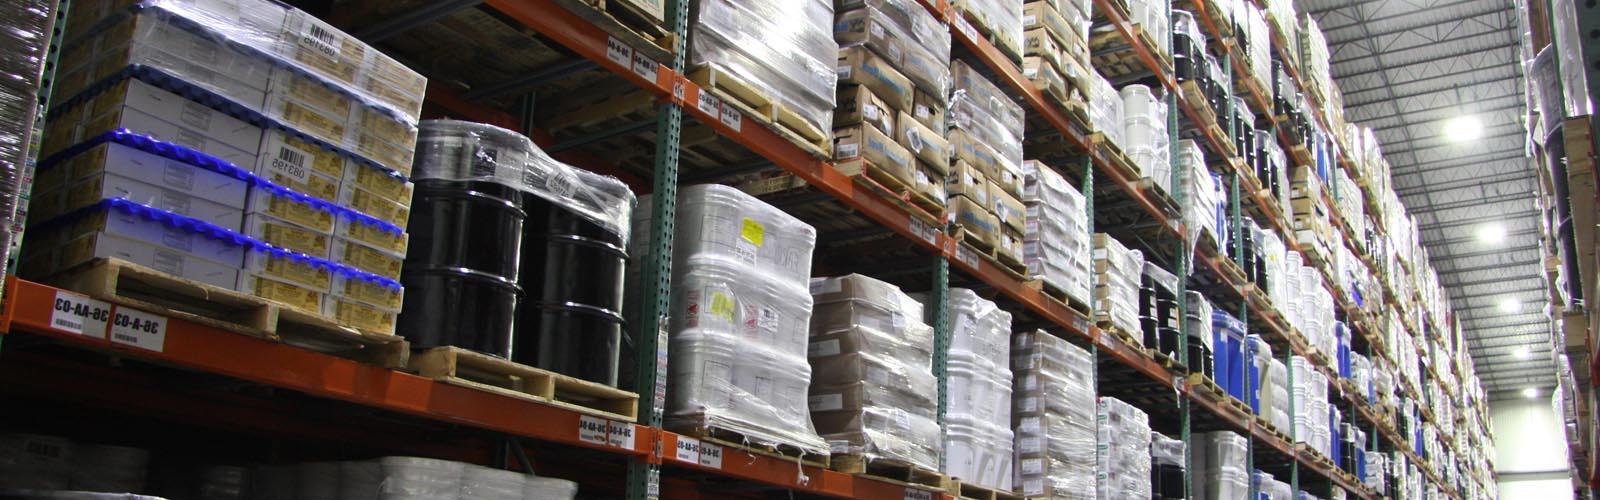 Multi-temperature Refrigerated Warehouse